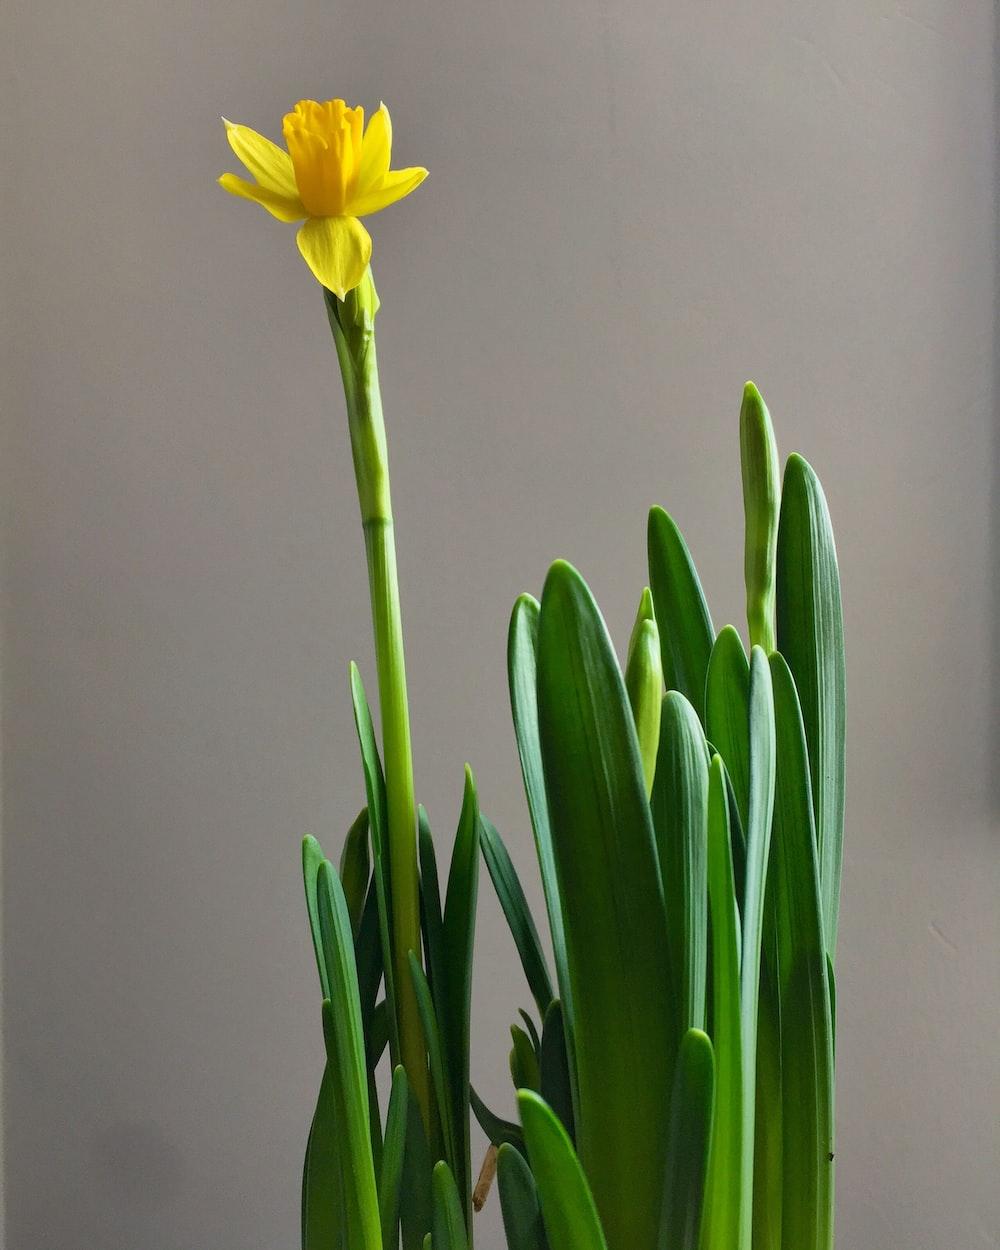 yellow petaled flower close up photo